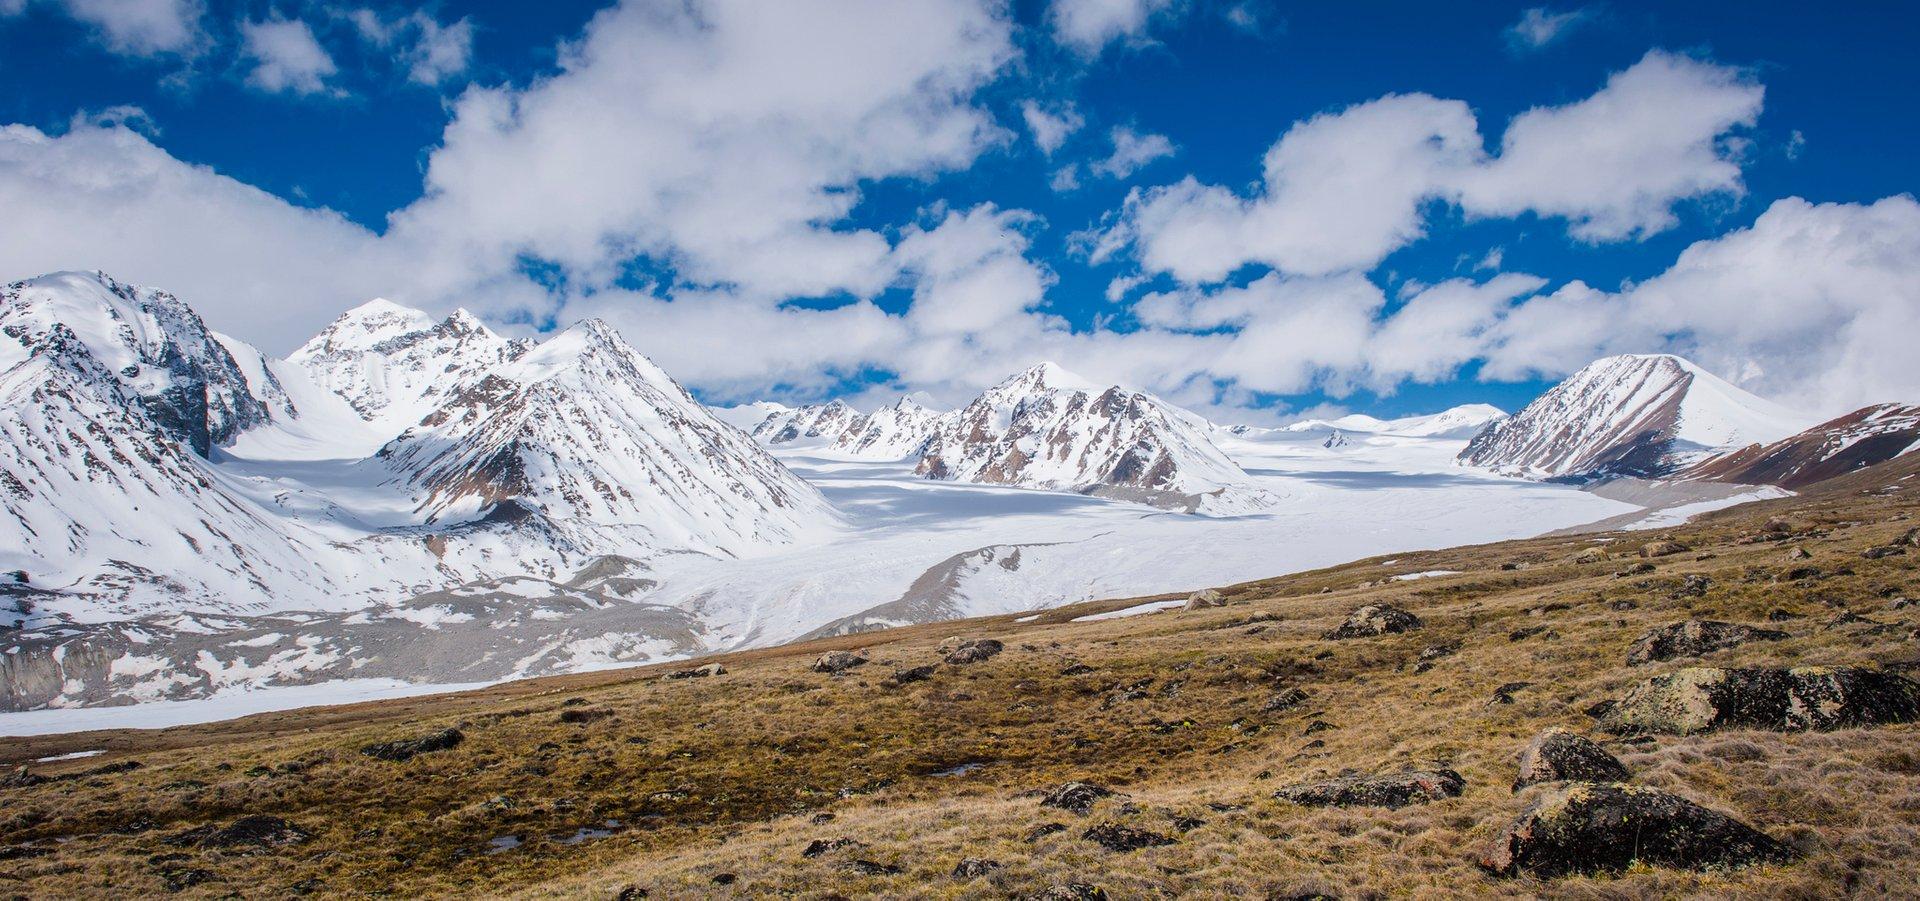 Trekking in the Altai in Mongolia - Best Season 2020